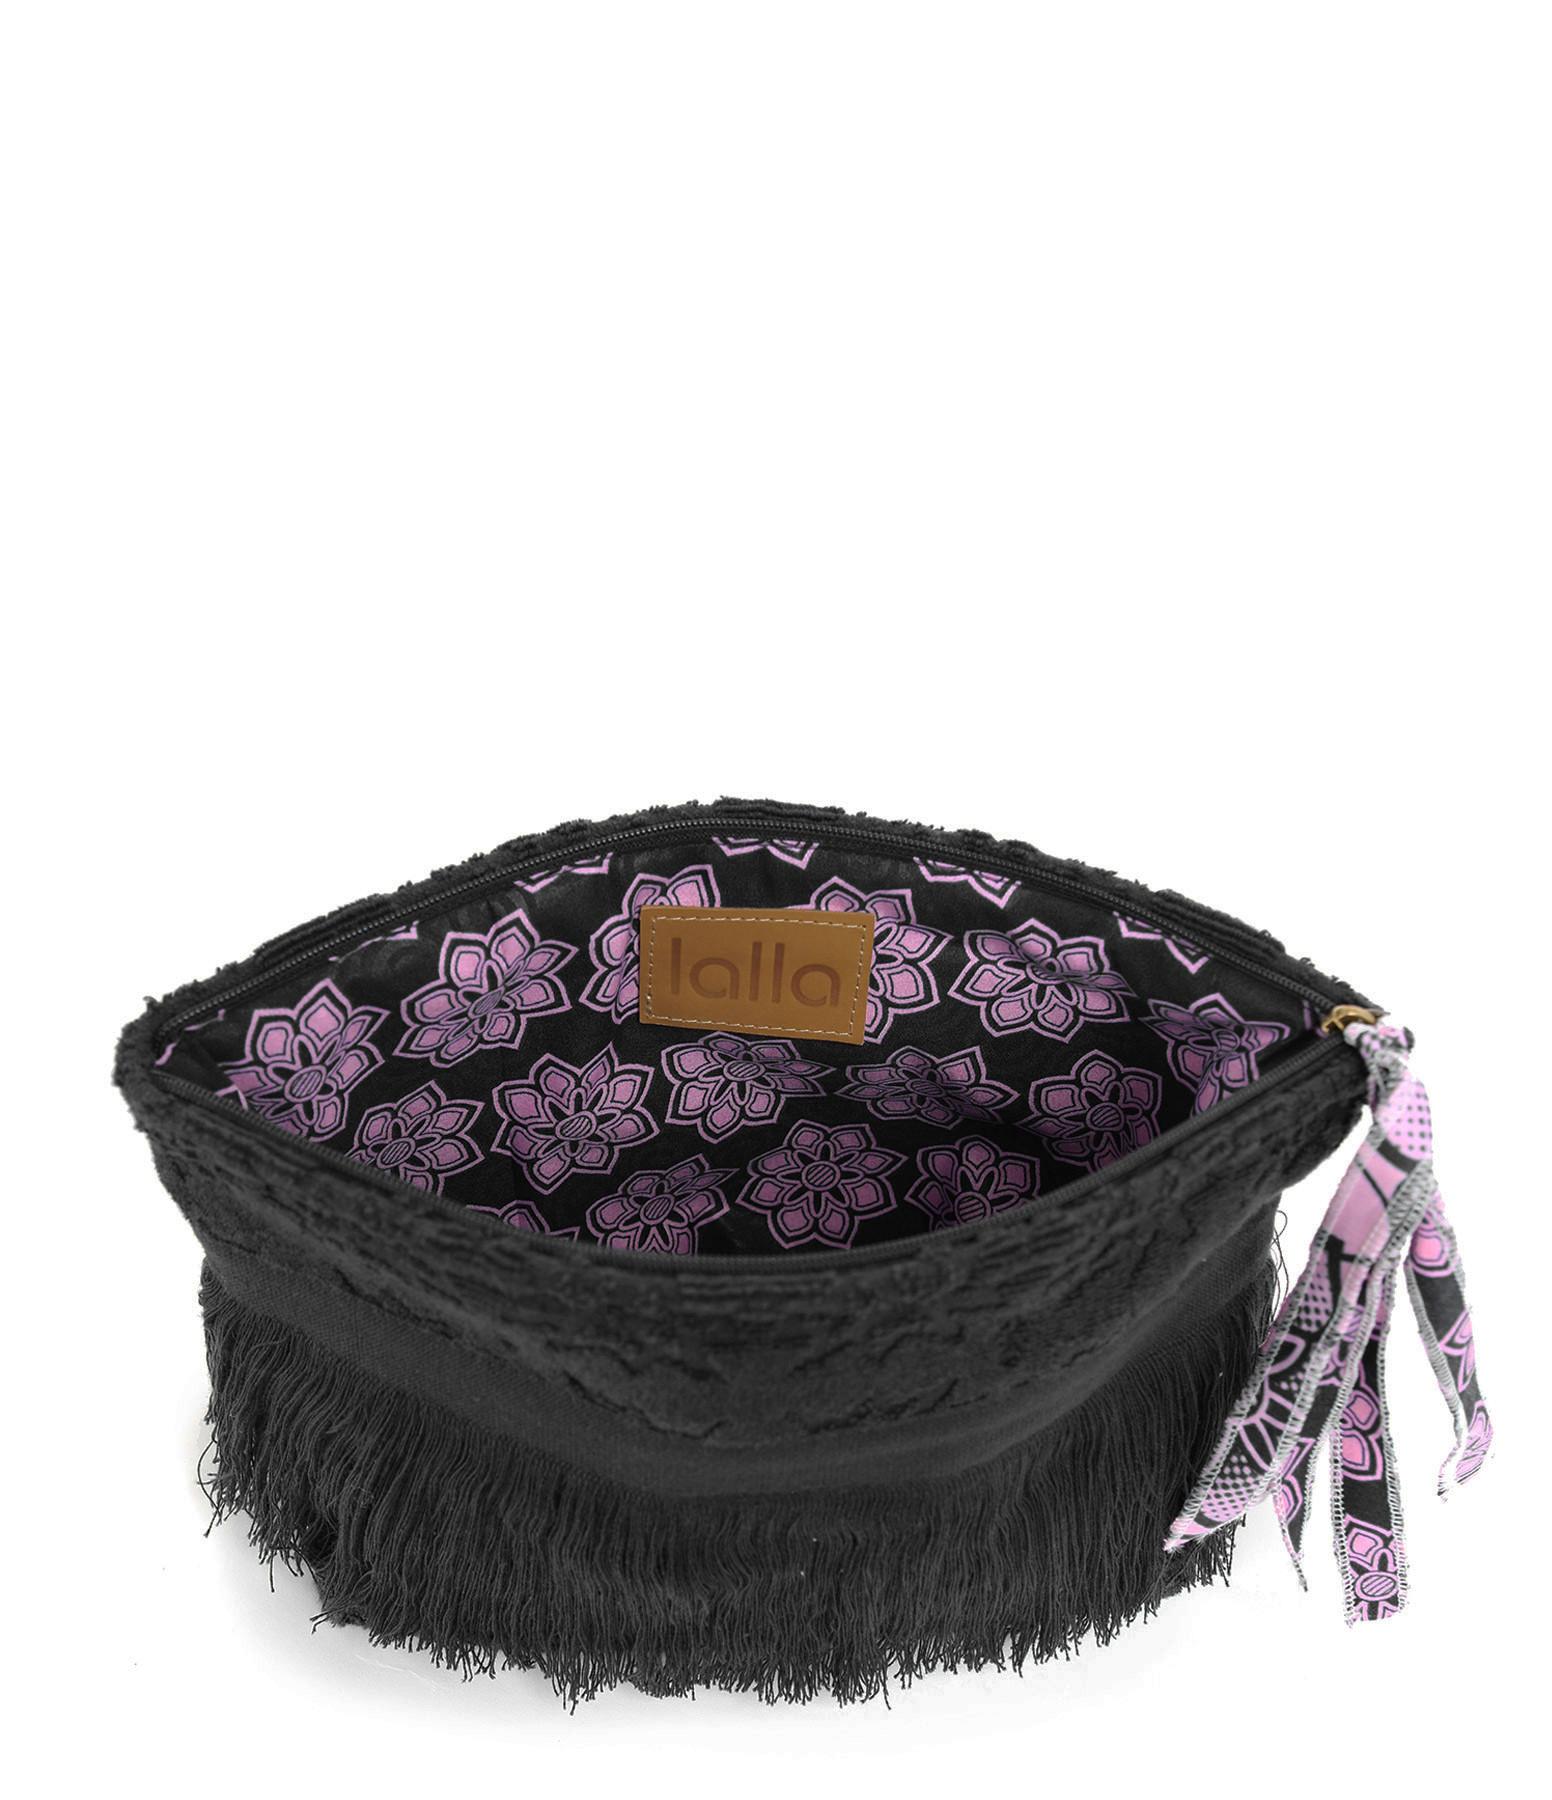 LALLA - Grande Trousse Walakin Hippie Éponge Noir